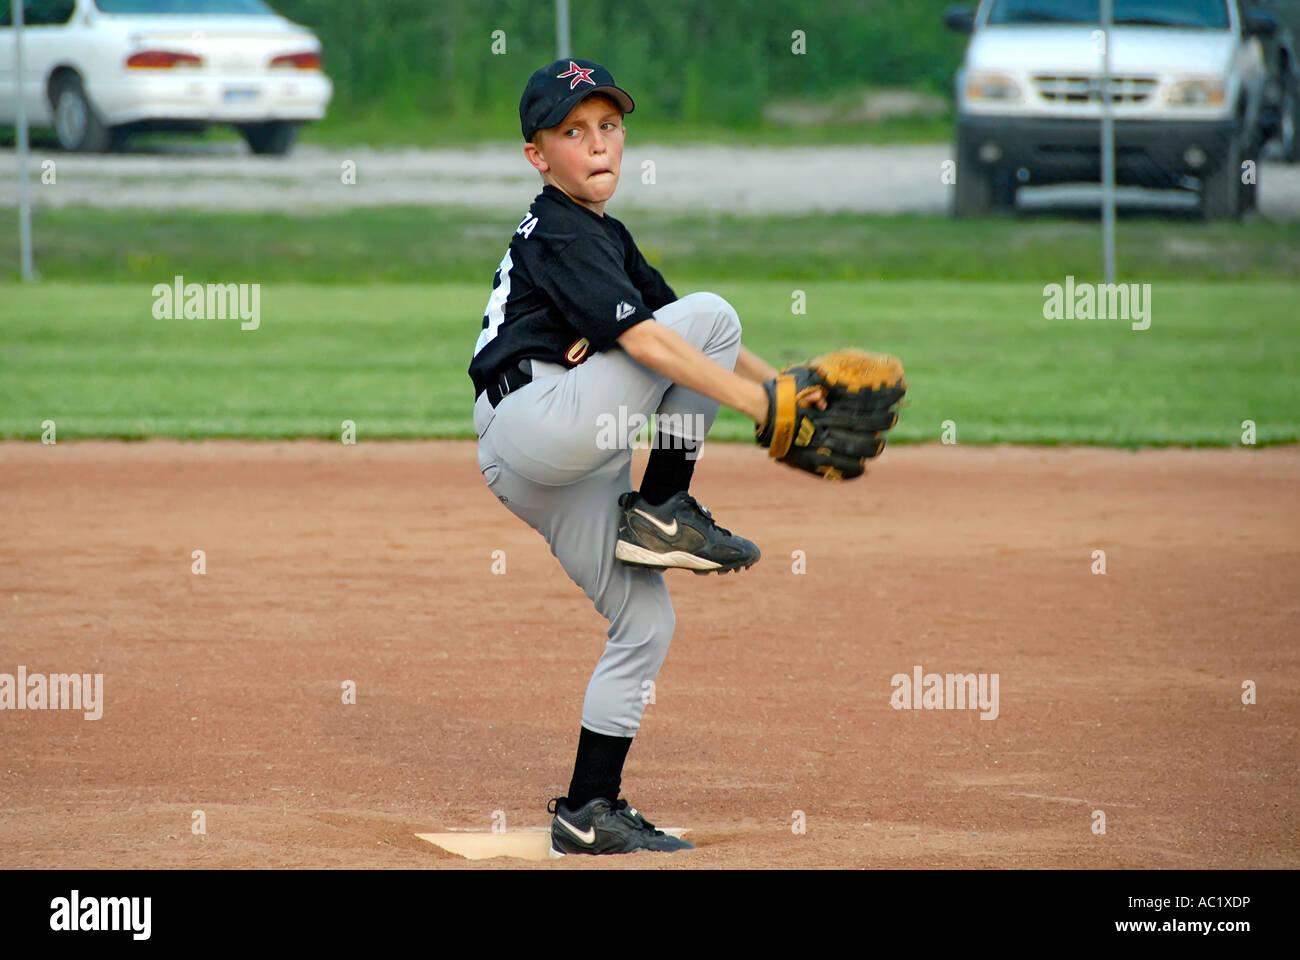 Little League Baseball pitcher player gettando un baseball Immagini Stock